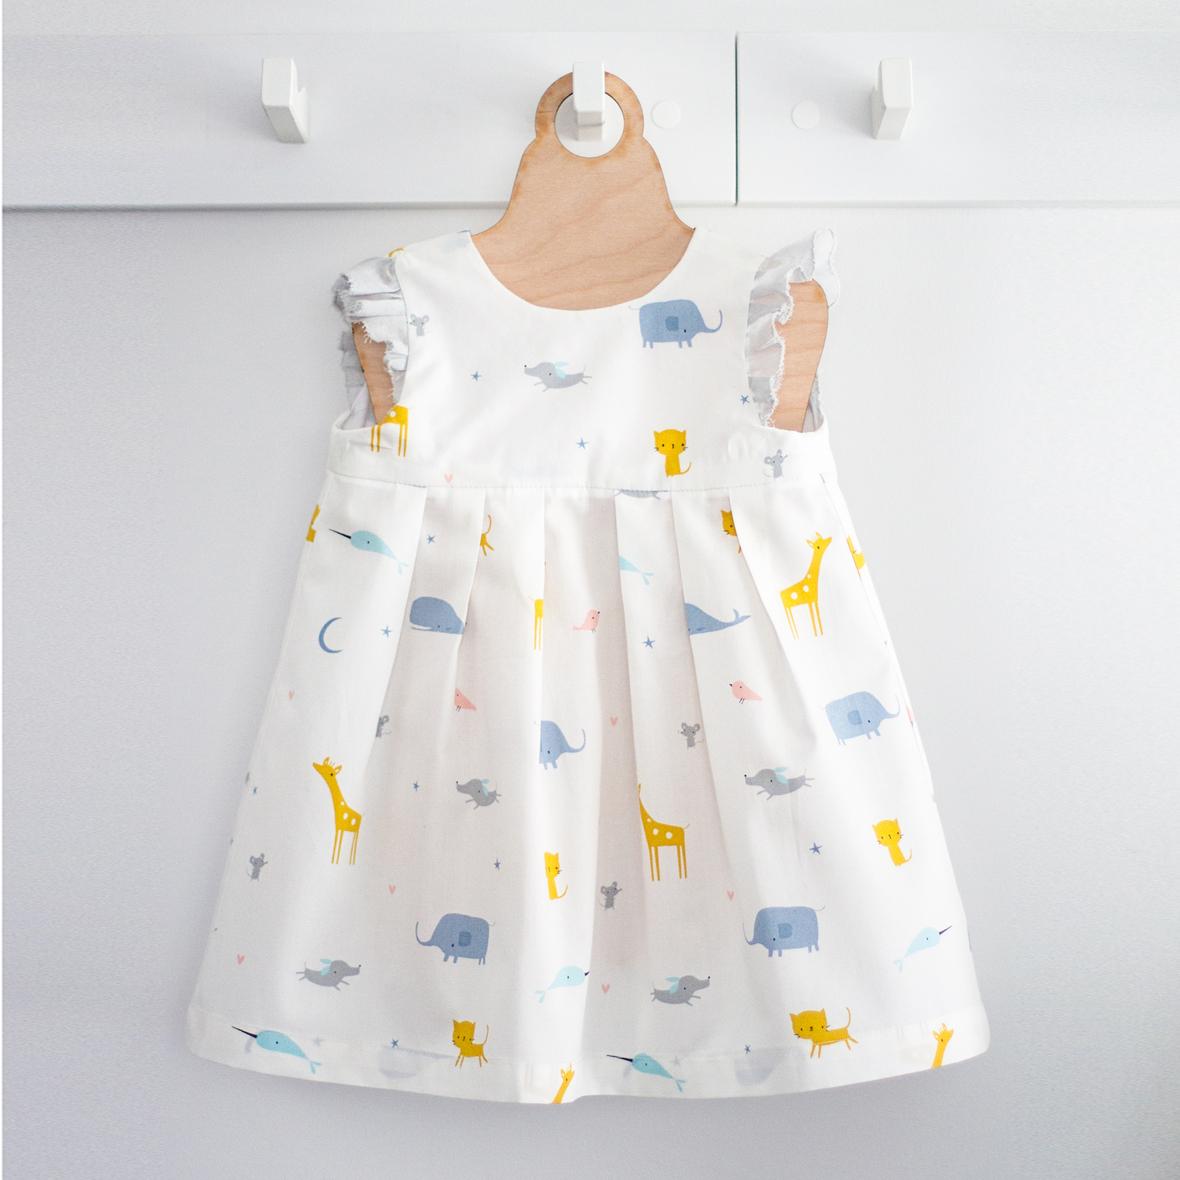 Cloud 9 - geranium dress - made by rae